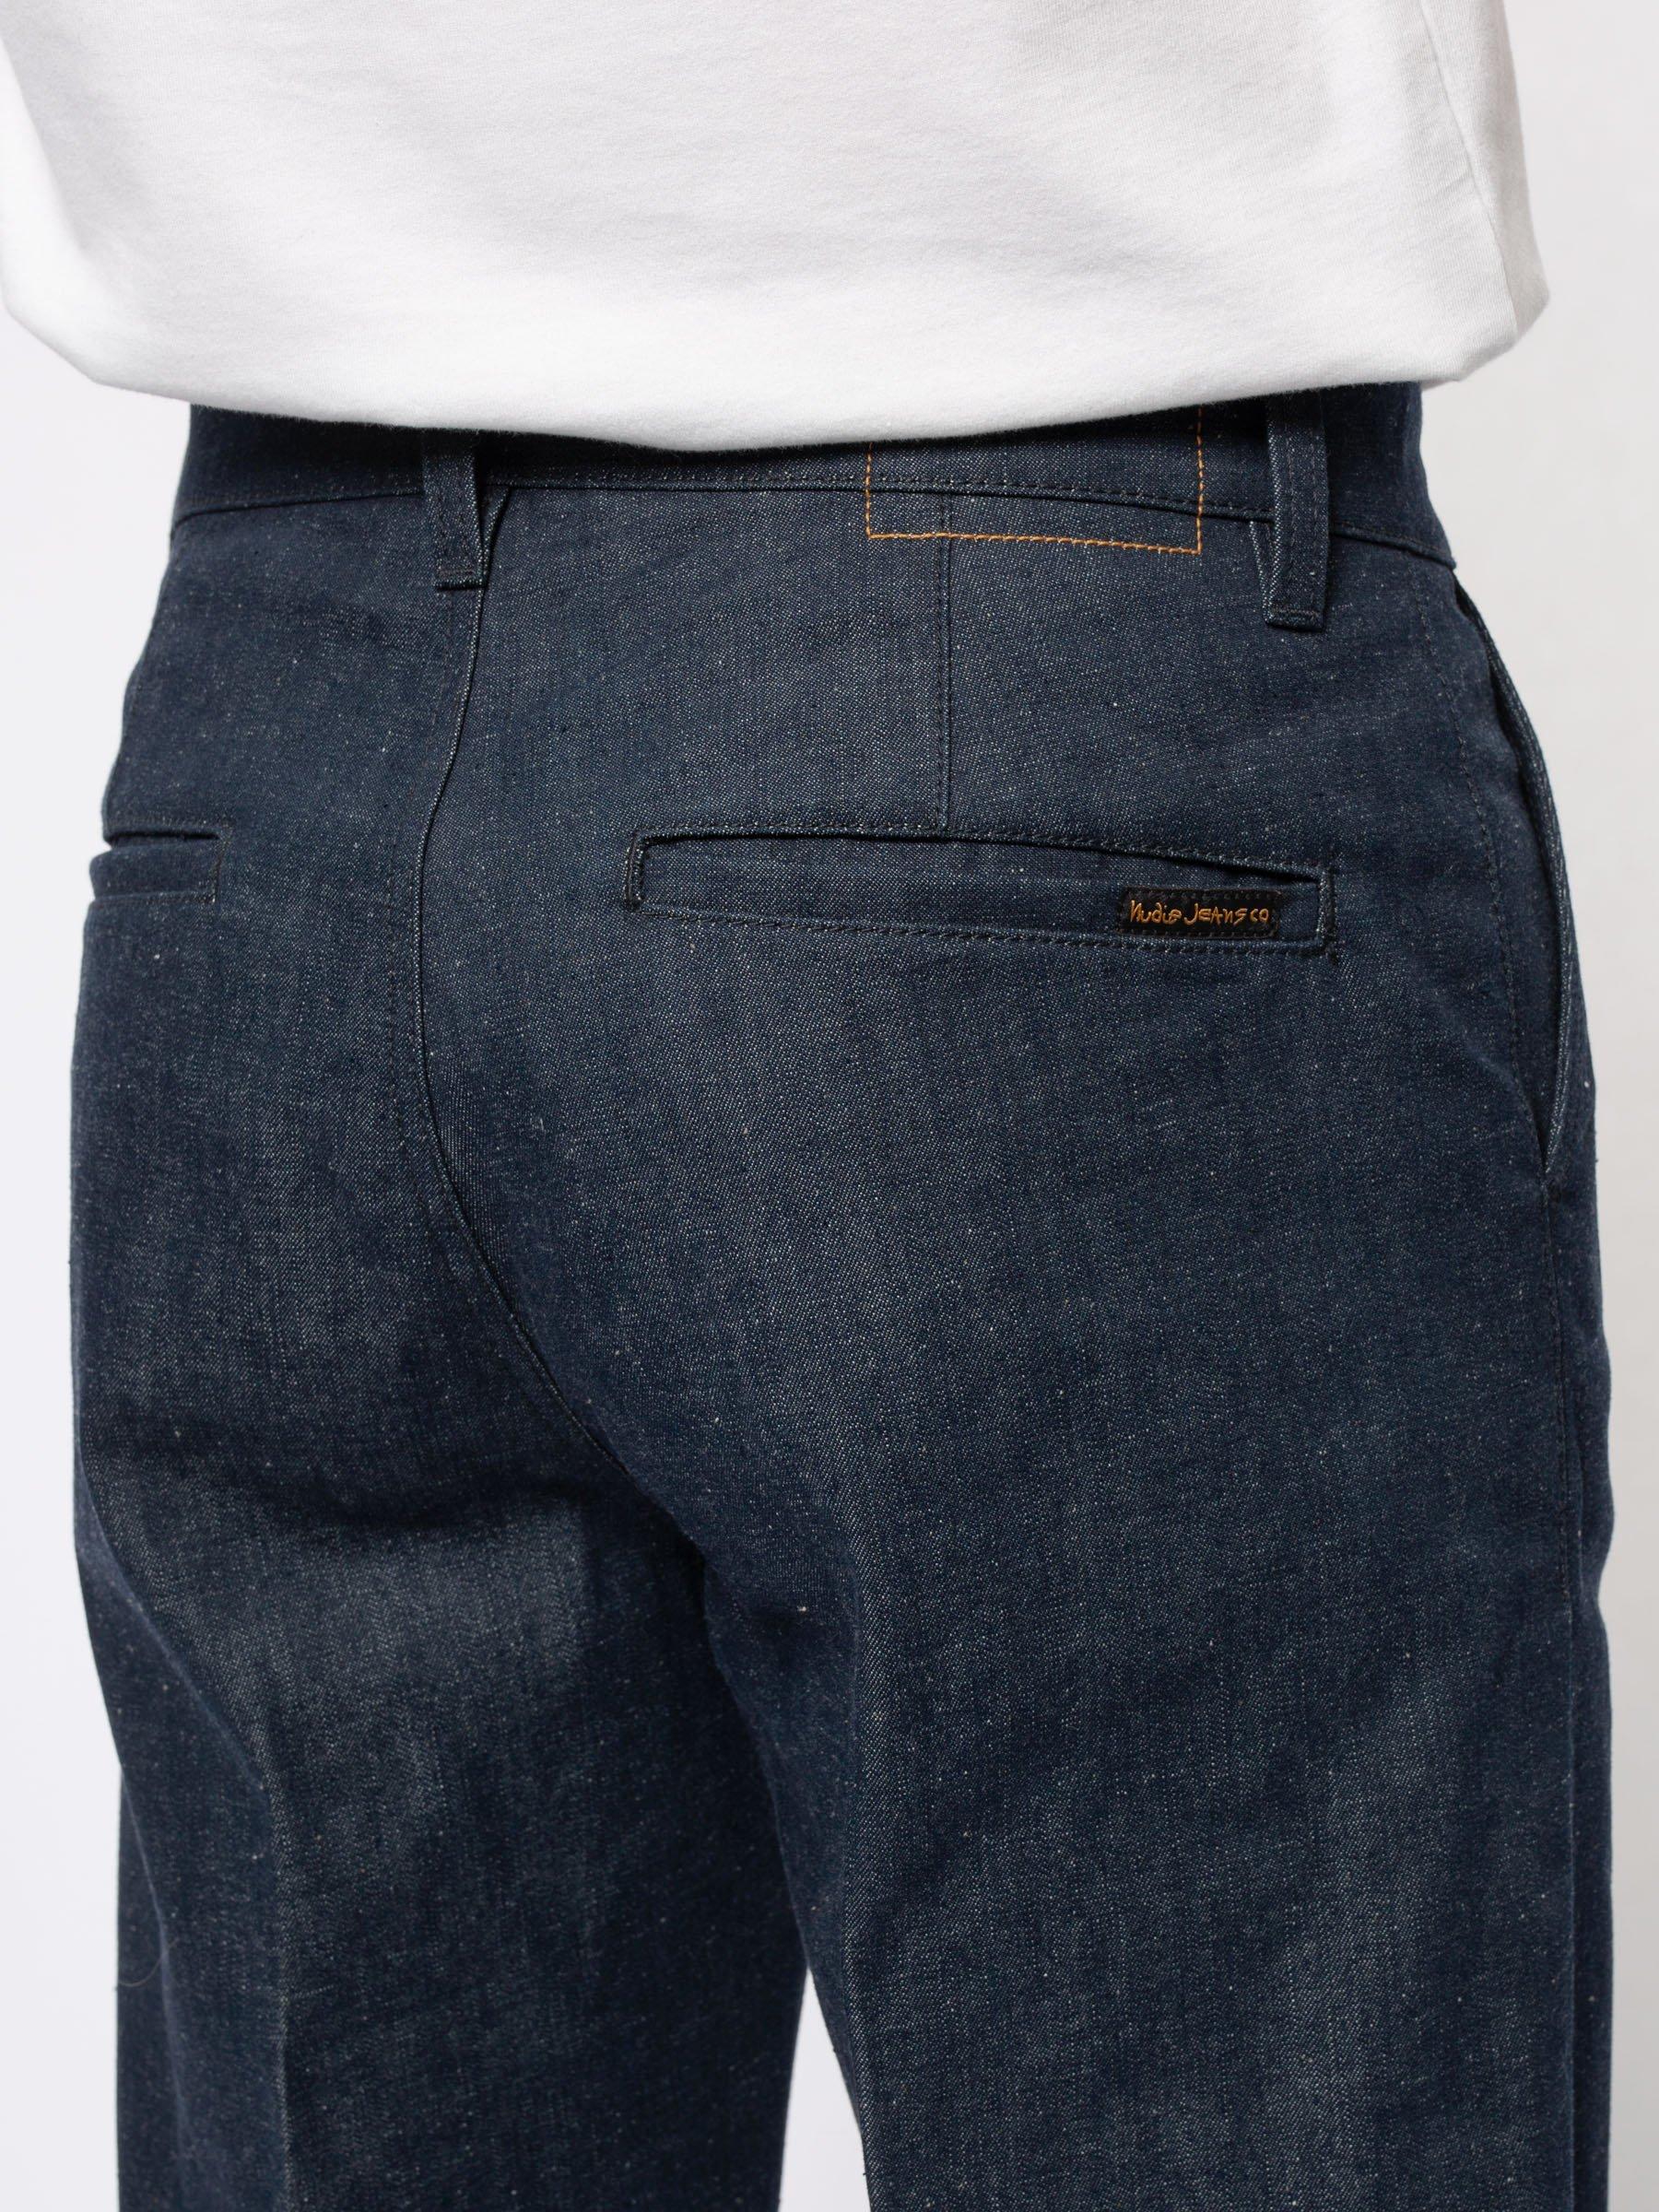 mespromenades-le-pantalon-dautmne-nudie-jeans-Lazy-Leo-Dry-Classic-Slub-120163-27_2400x2400